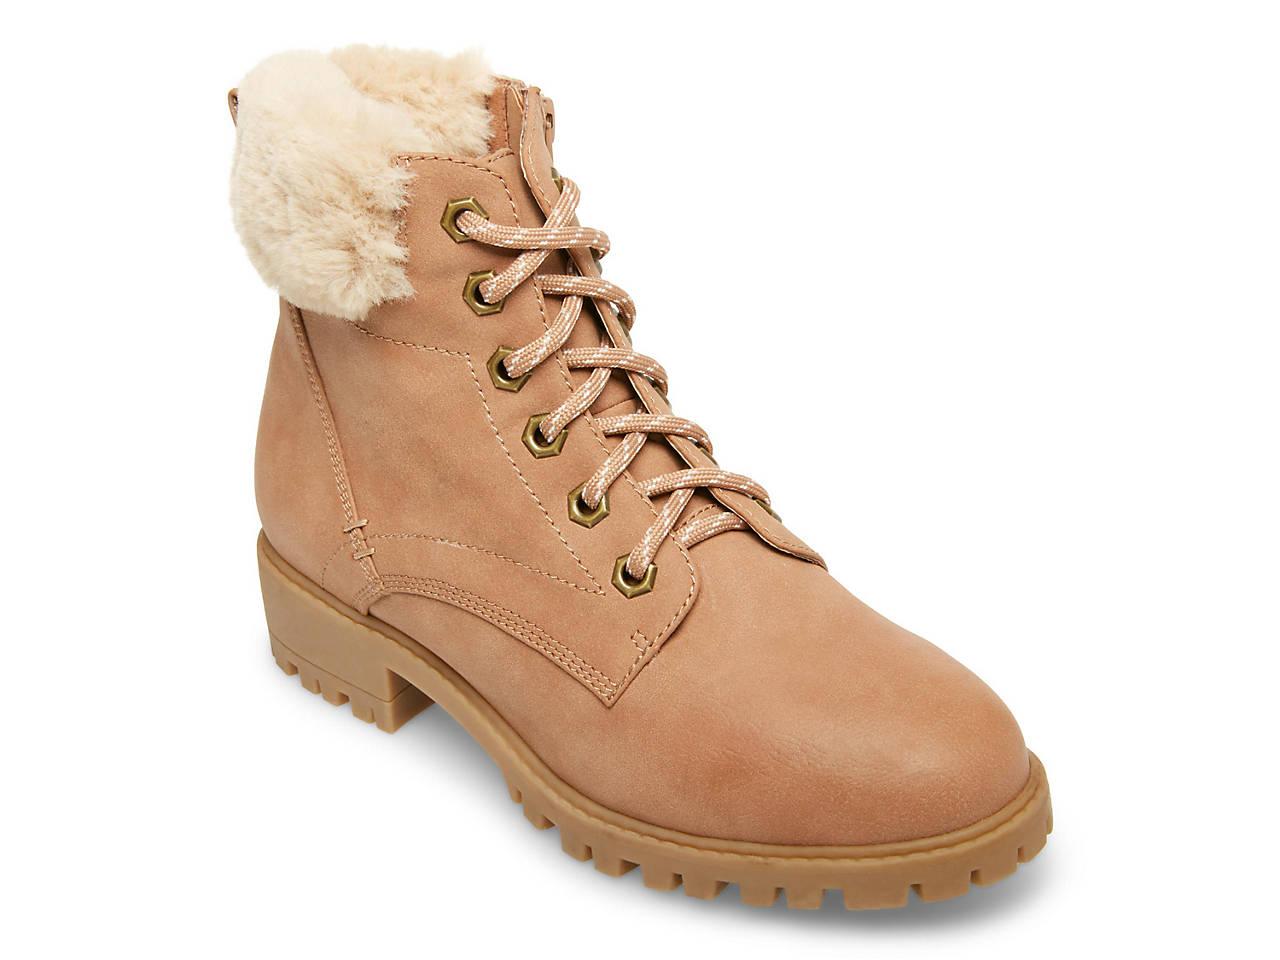 ebc87282e5 Madden Girl Fritz Bootie Women's Shoes | DSW